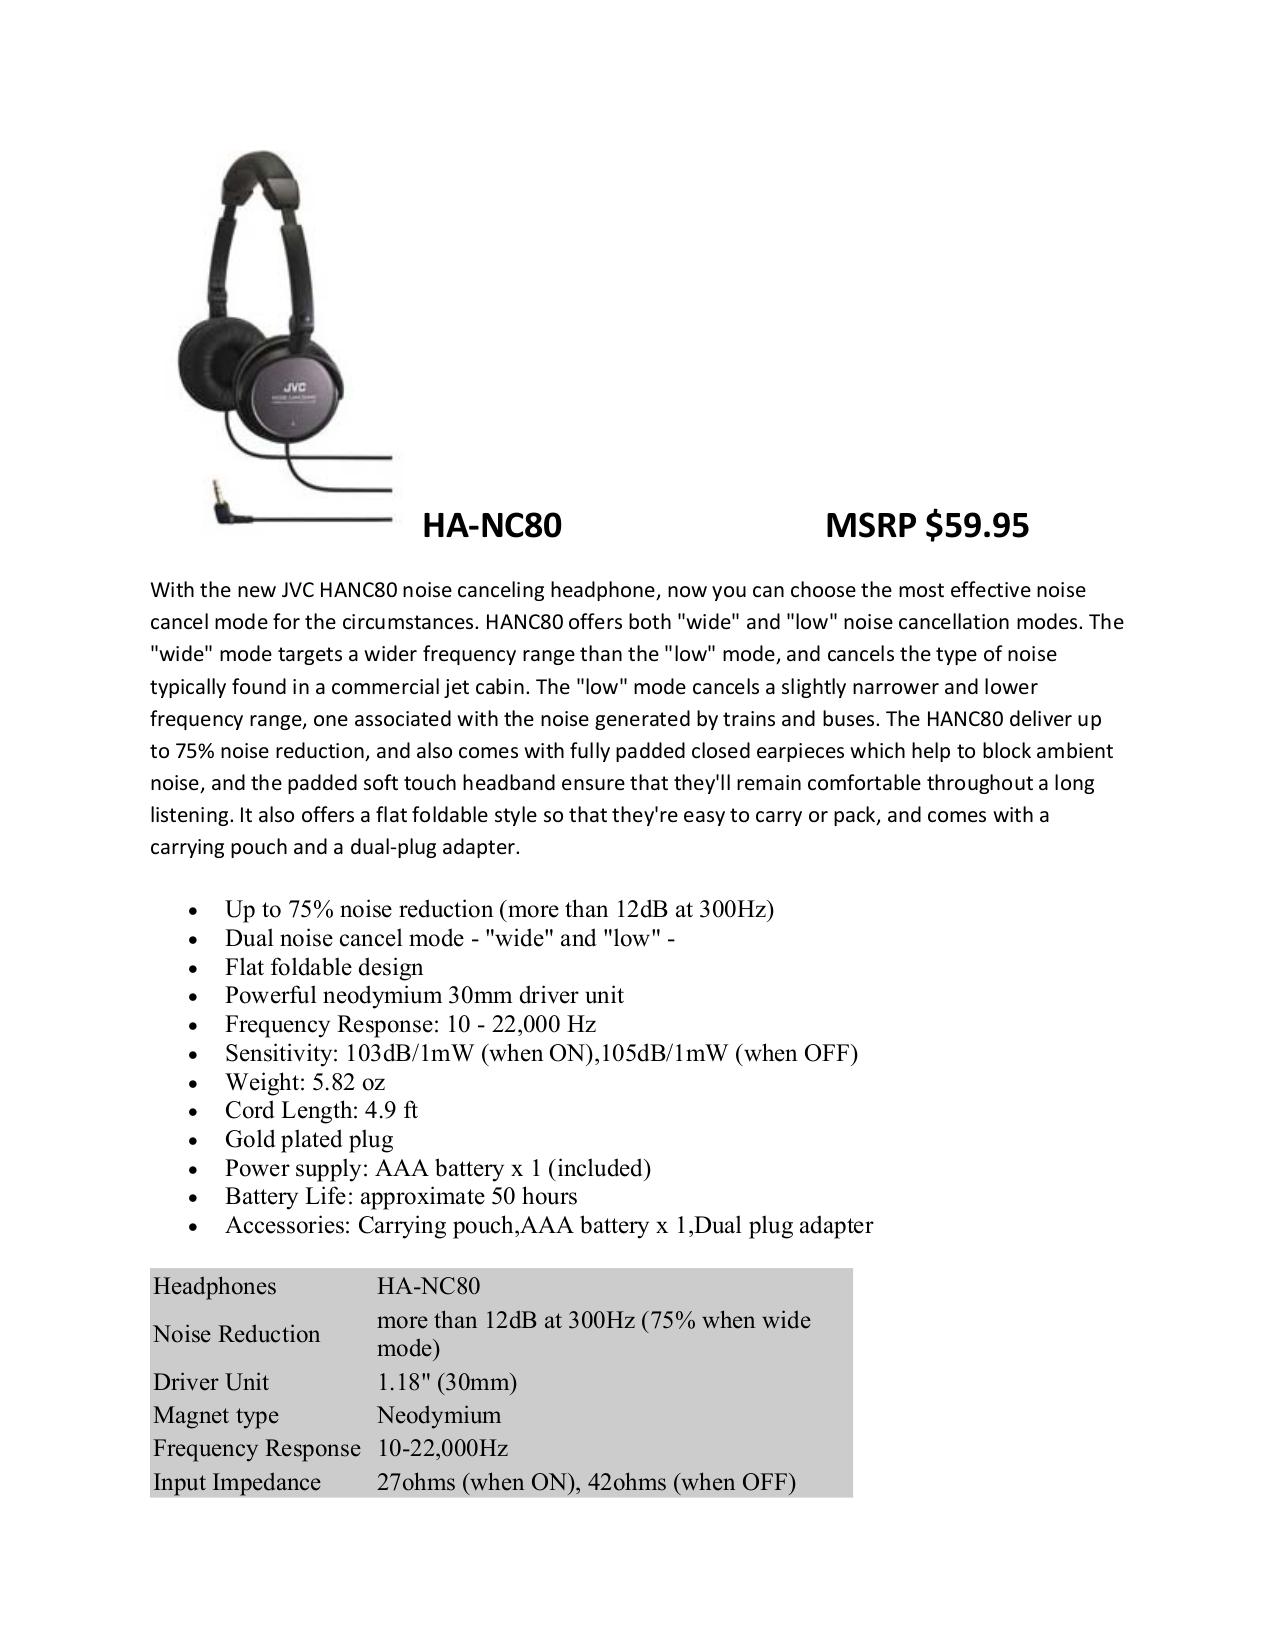 pdf for JVC Headphone HA-NC80 manual